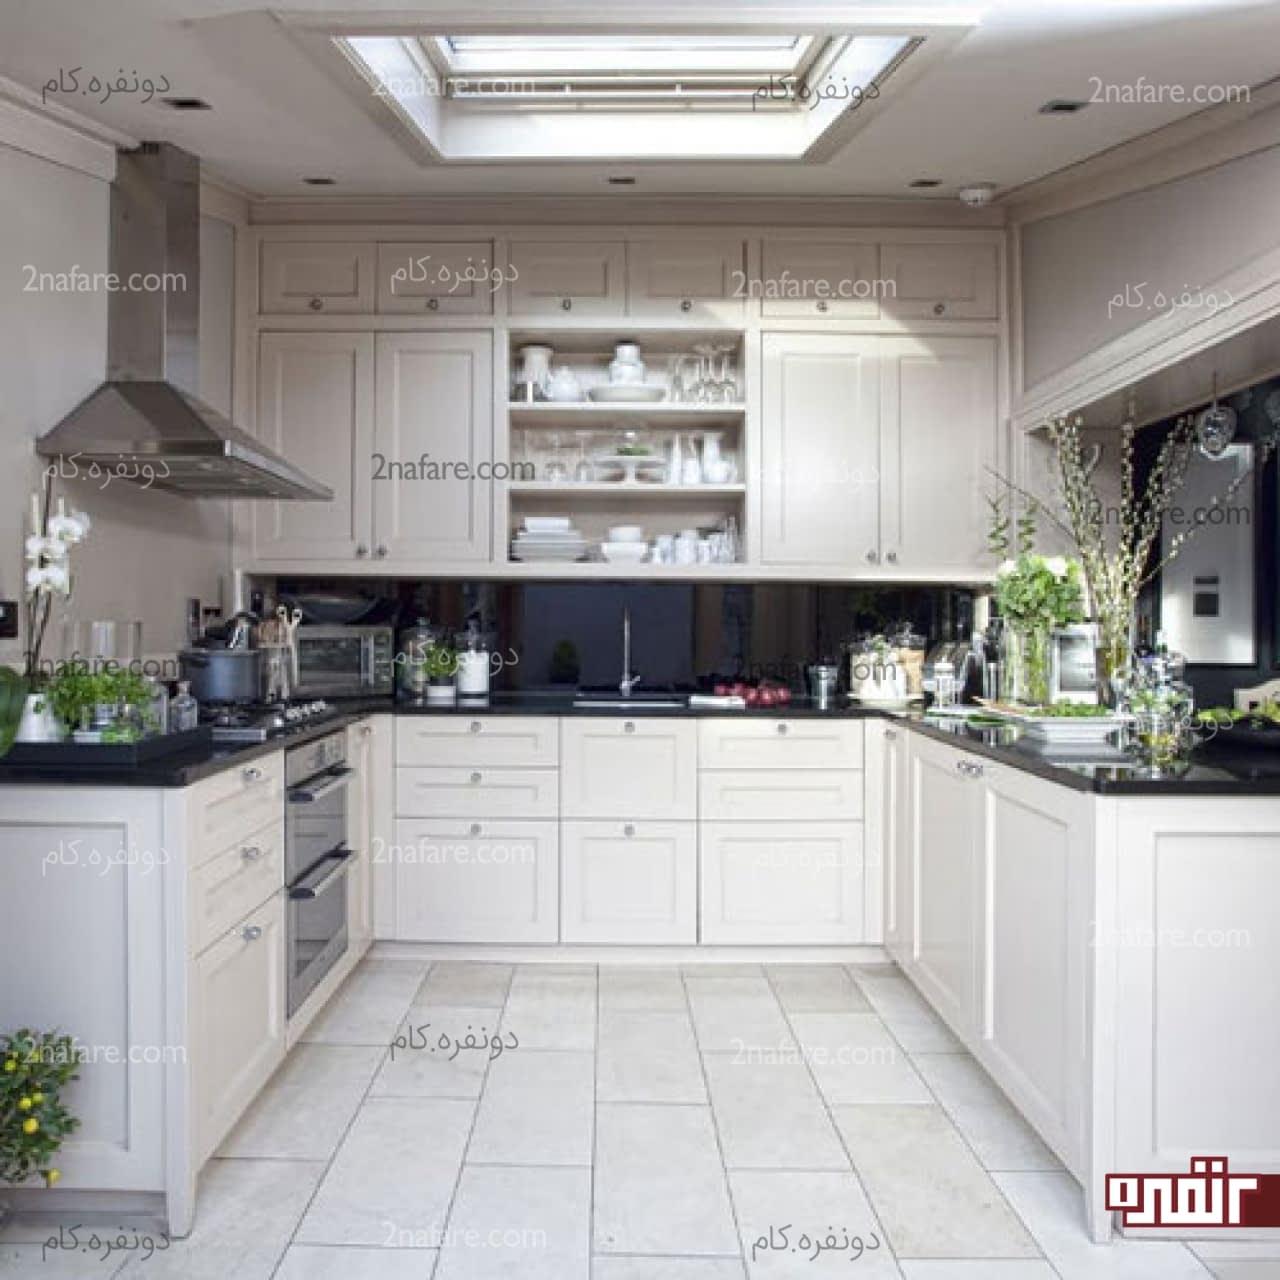 U Shaped Kitchen With Island Floor Plan: طراحی های پرطرفدار آشپزخانه مدرن • دونفره